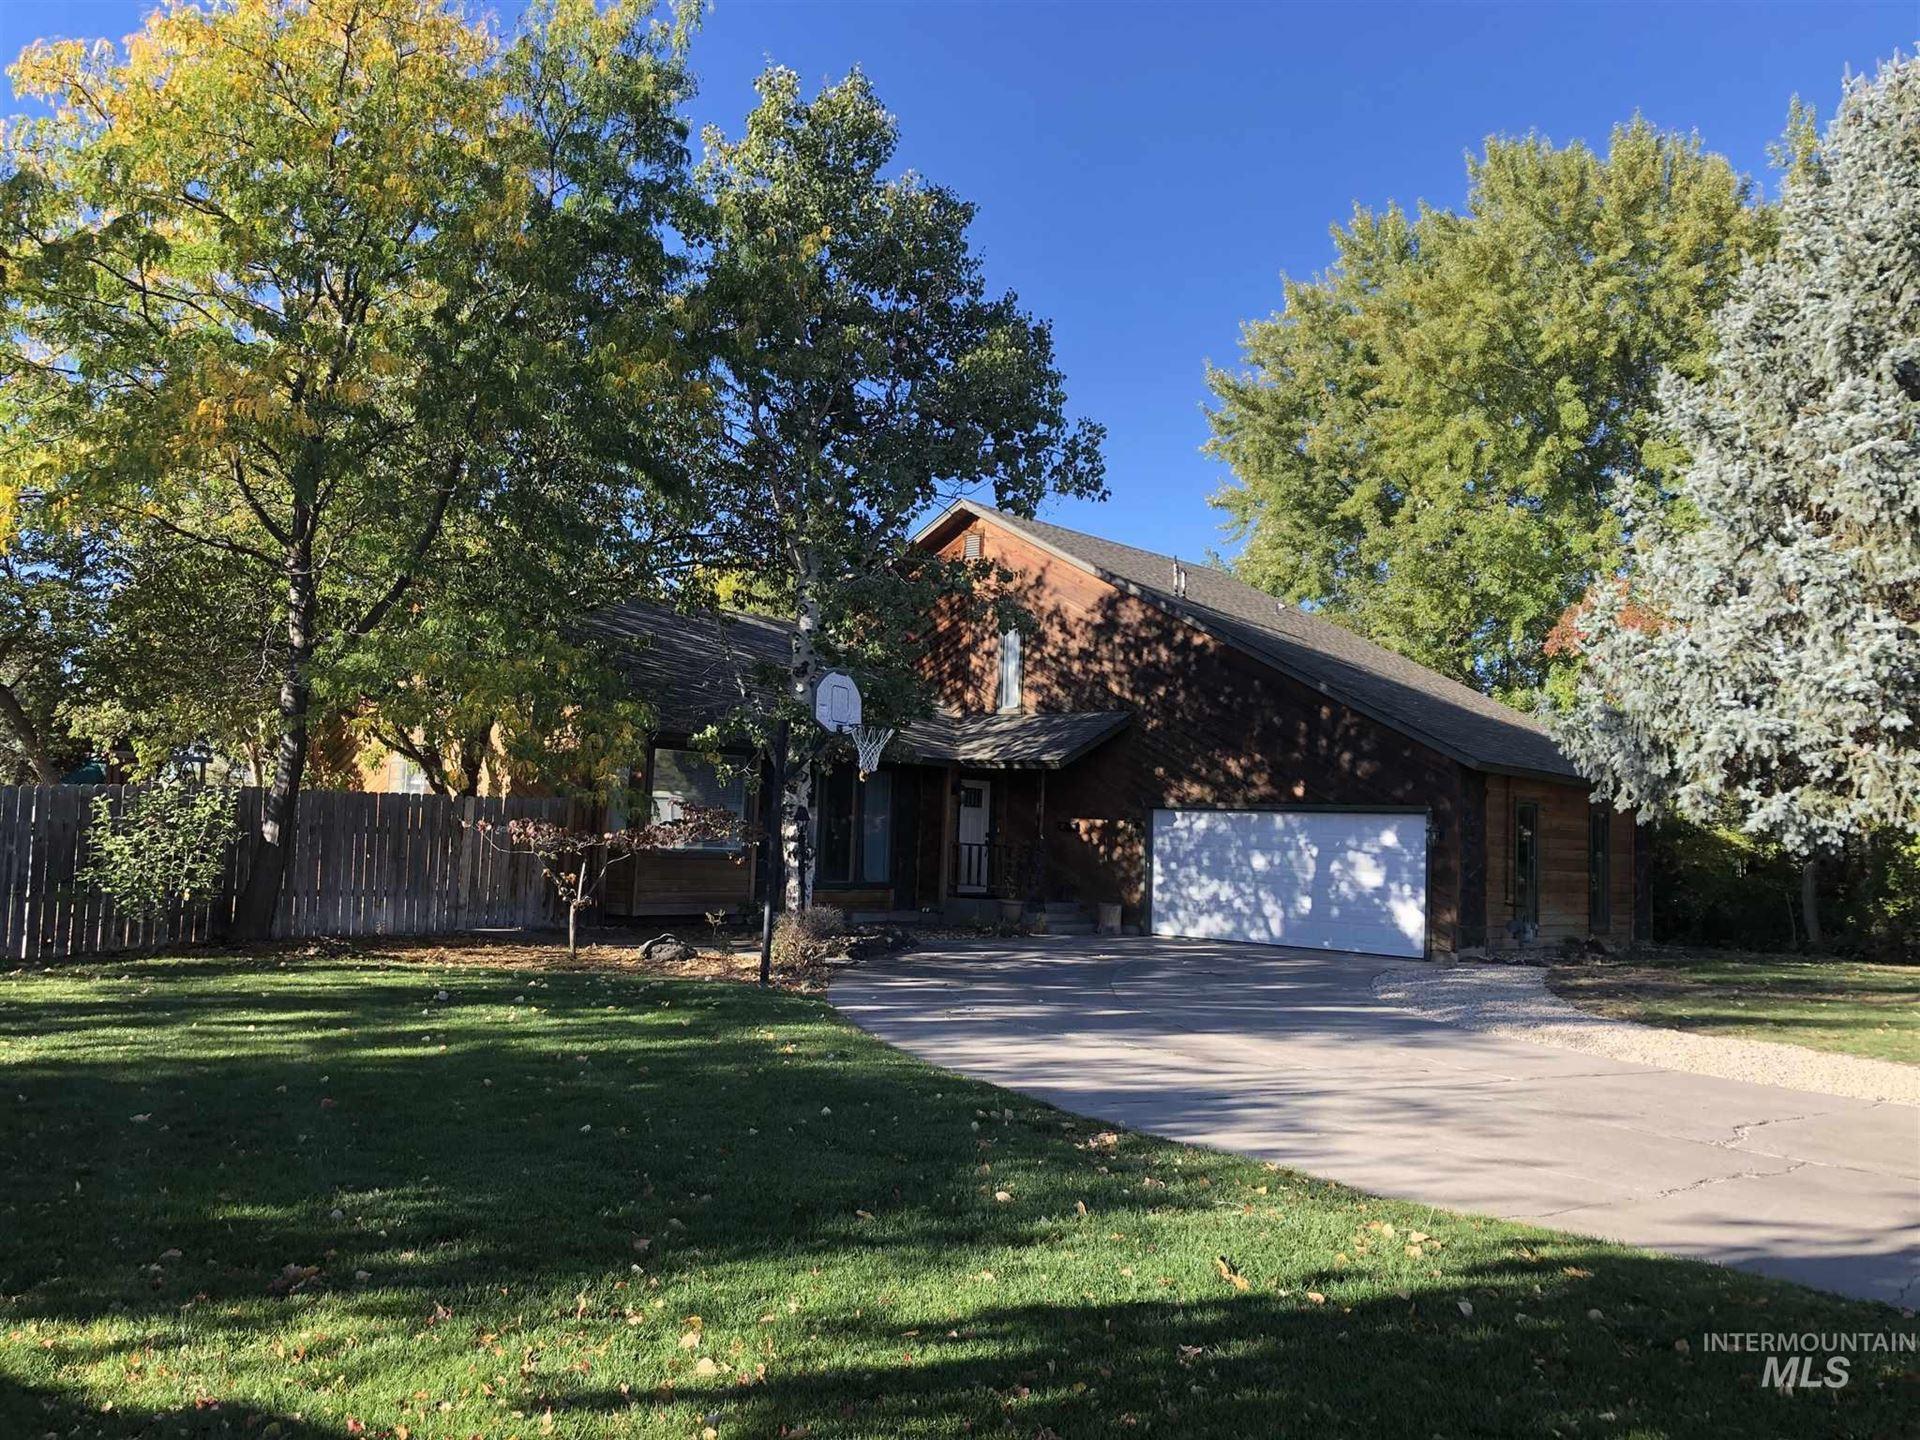 Photo of 435 E 16th N, Mountain Home, ID 83647 (MLS # 98784332)